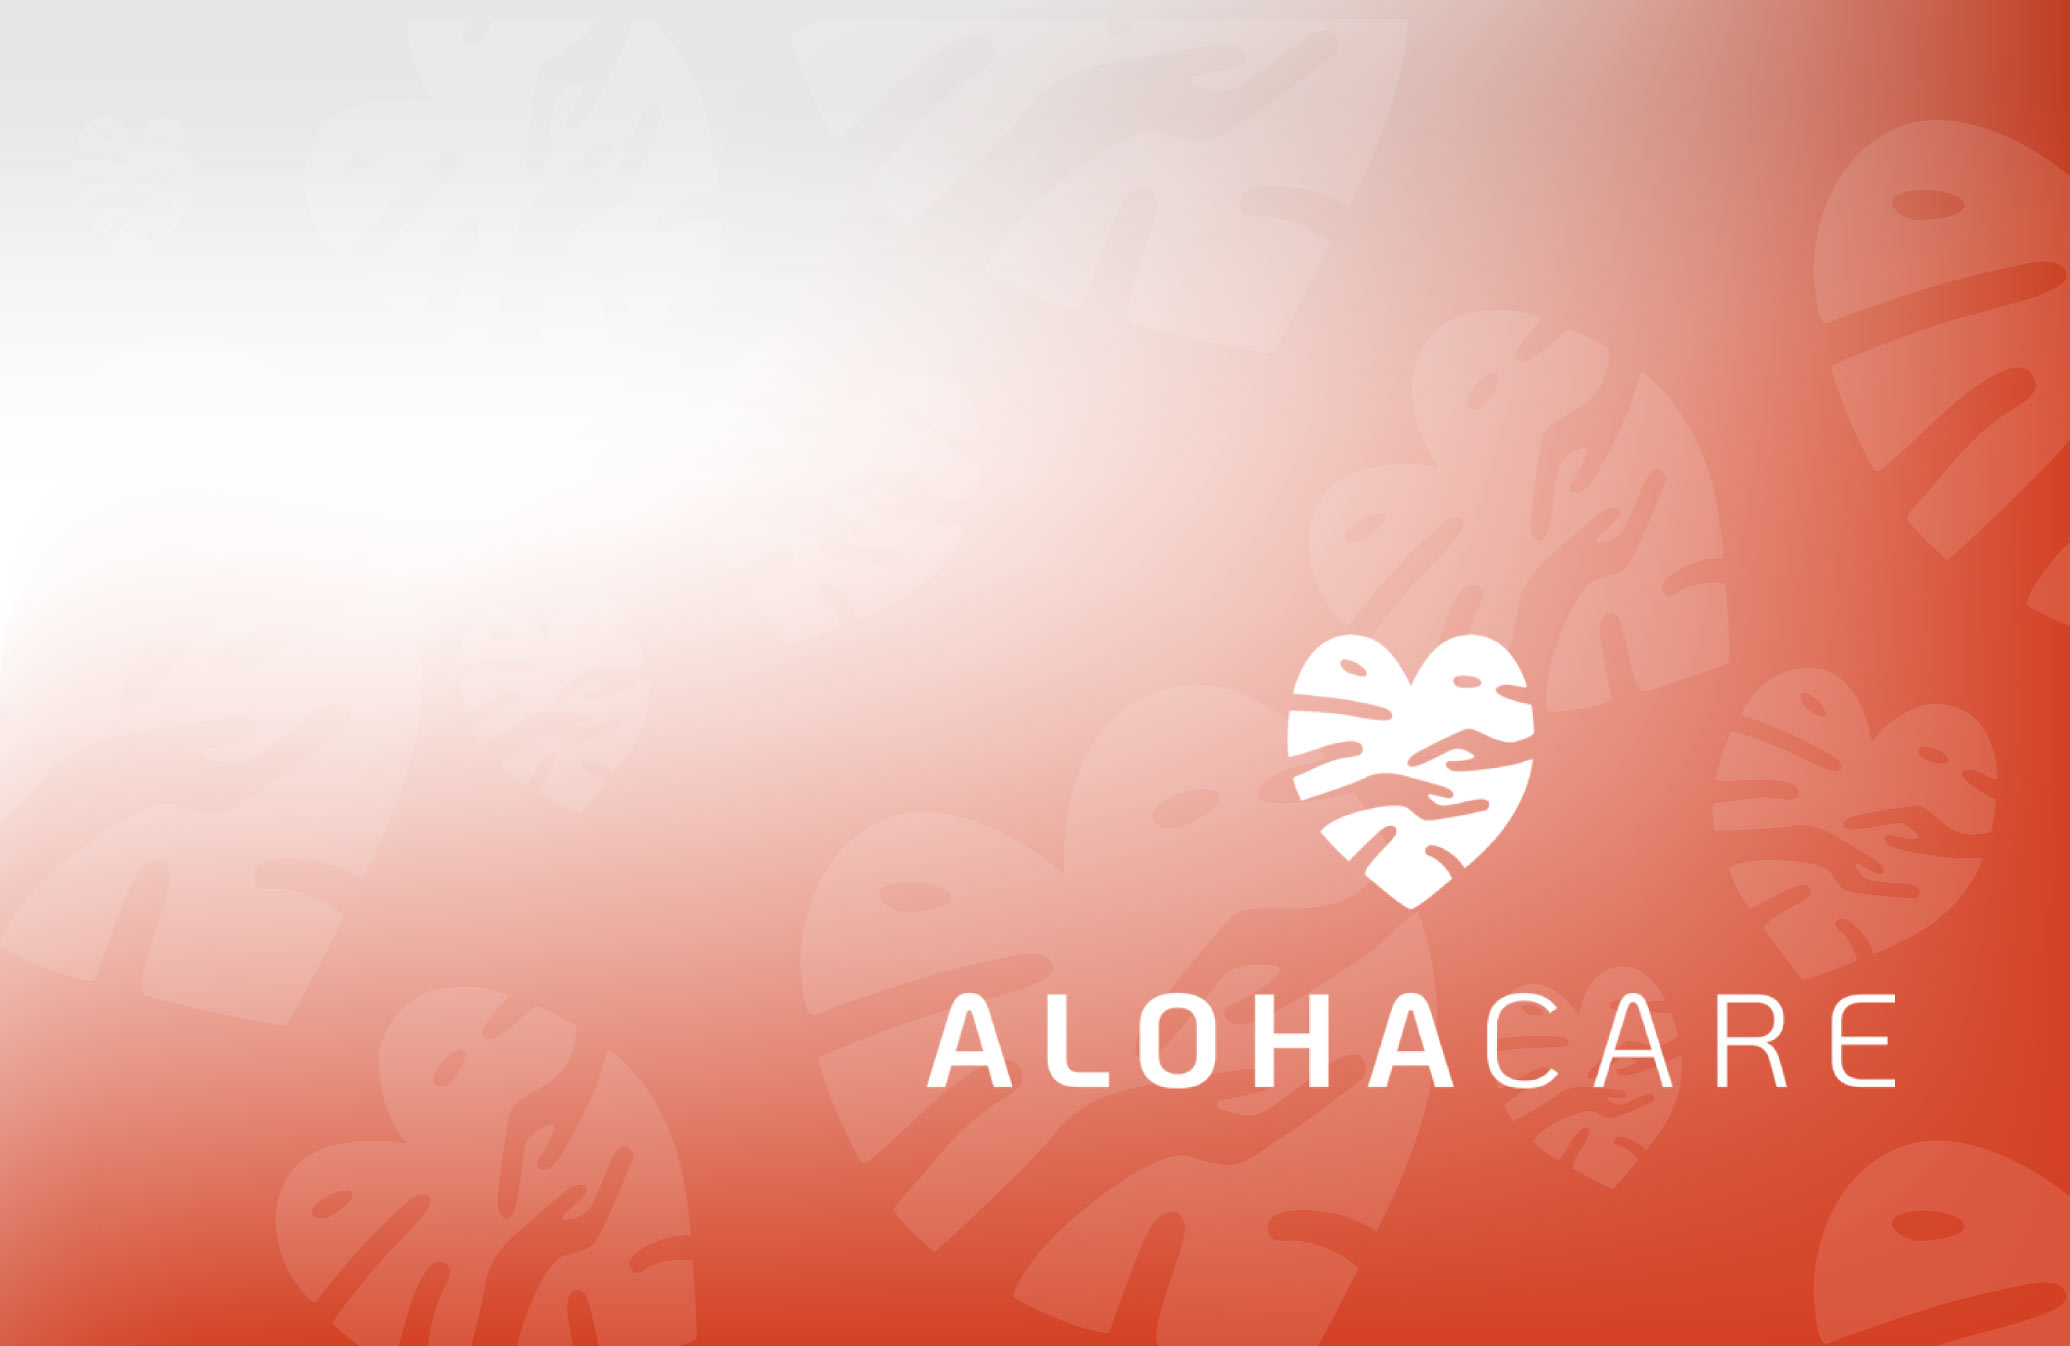 alohacare press release news